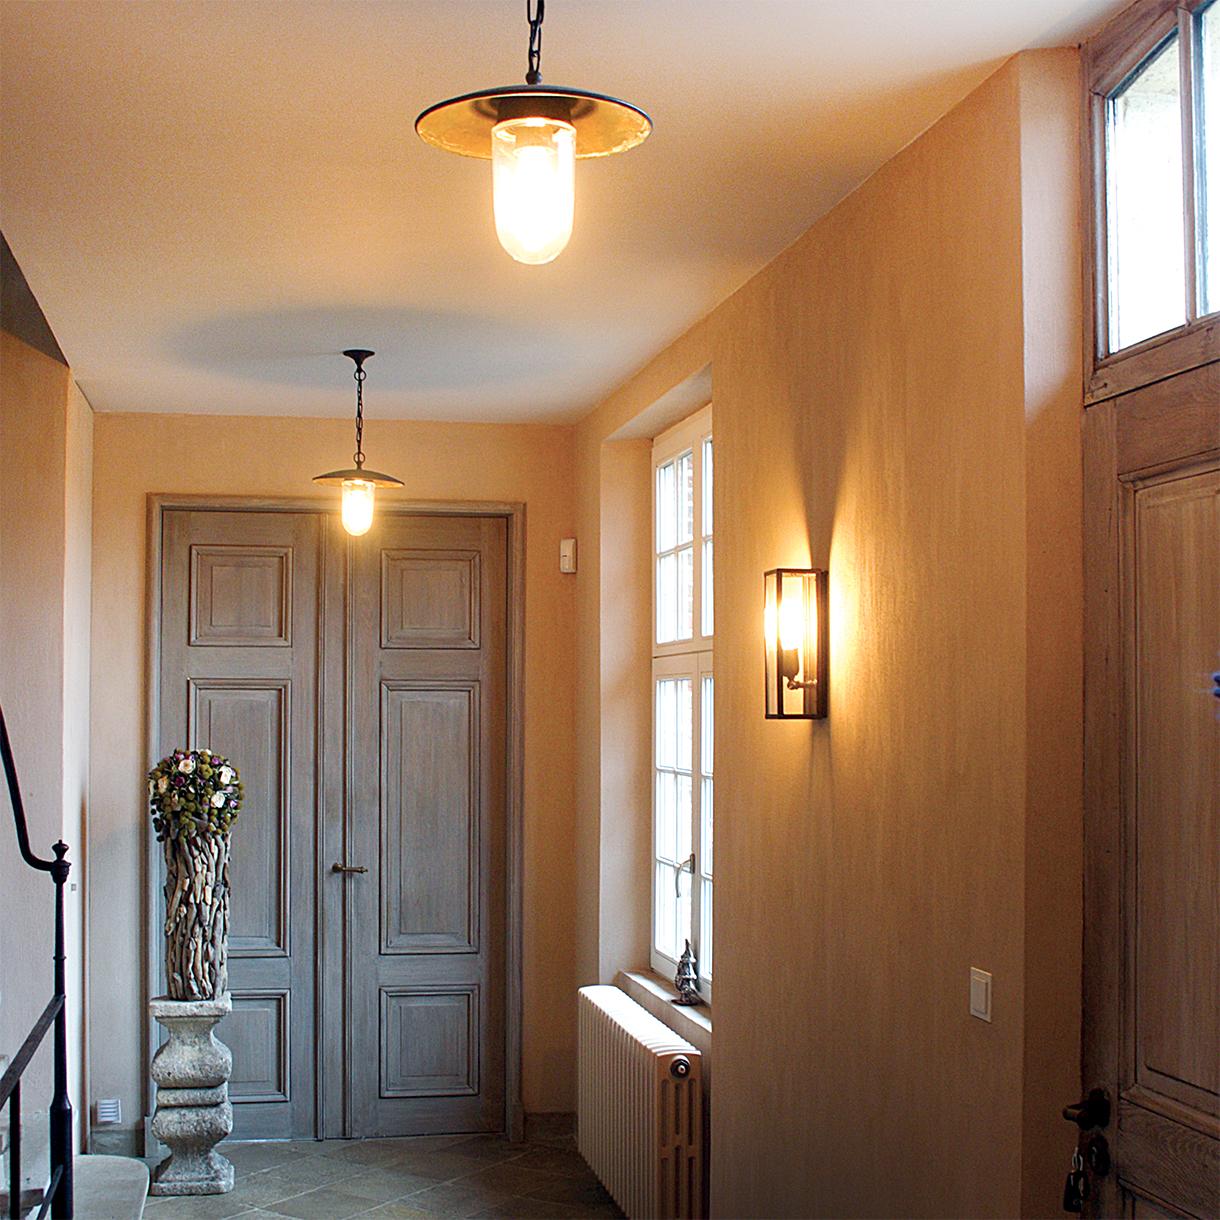 hanglamp hal met ketting landelijk brons, geborsteld nikkel of chroom